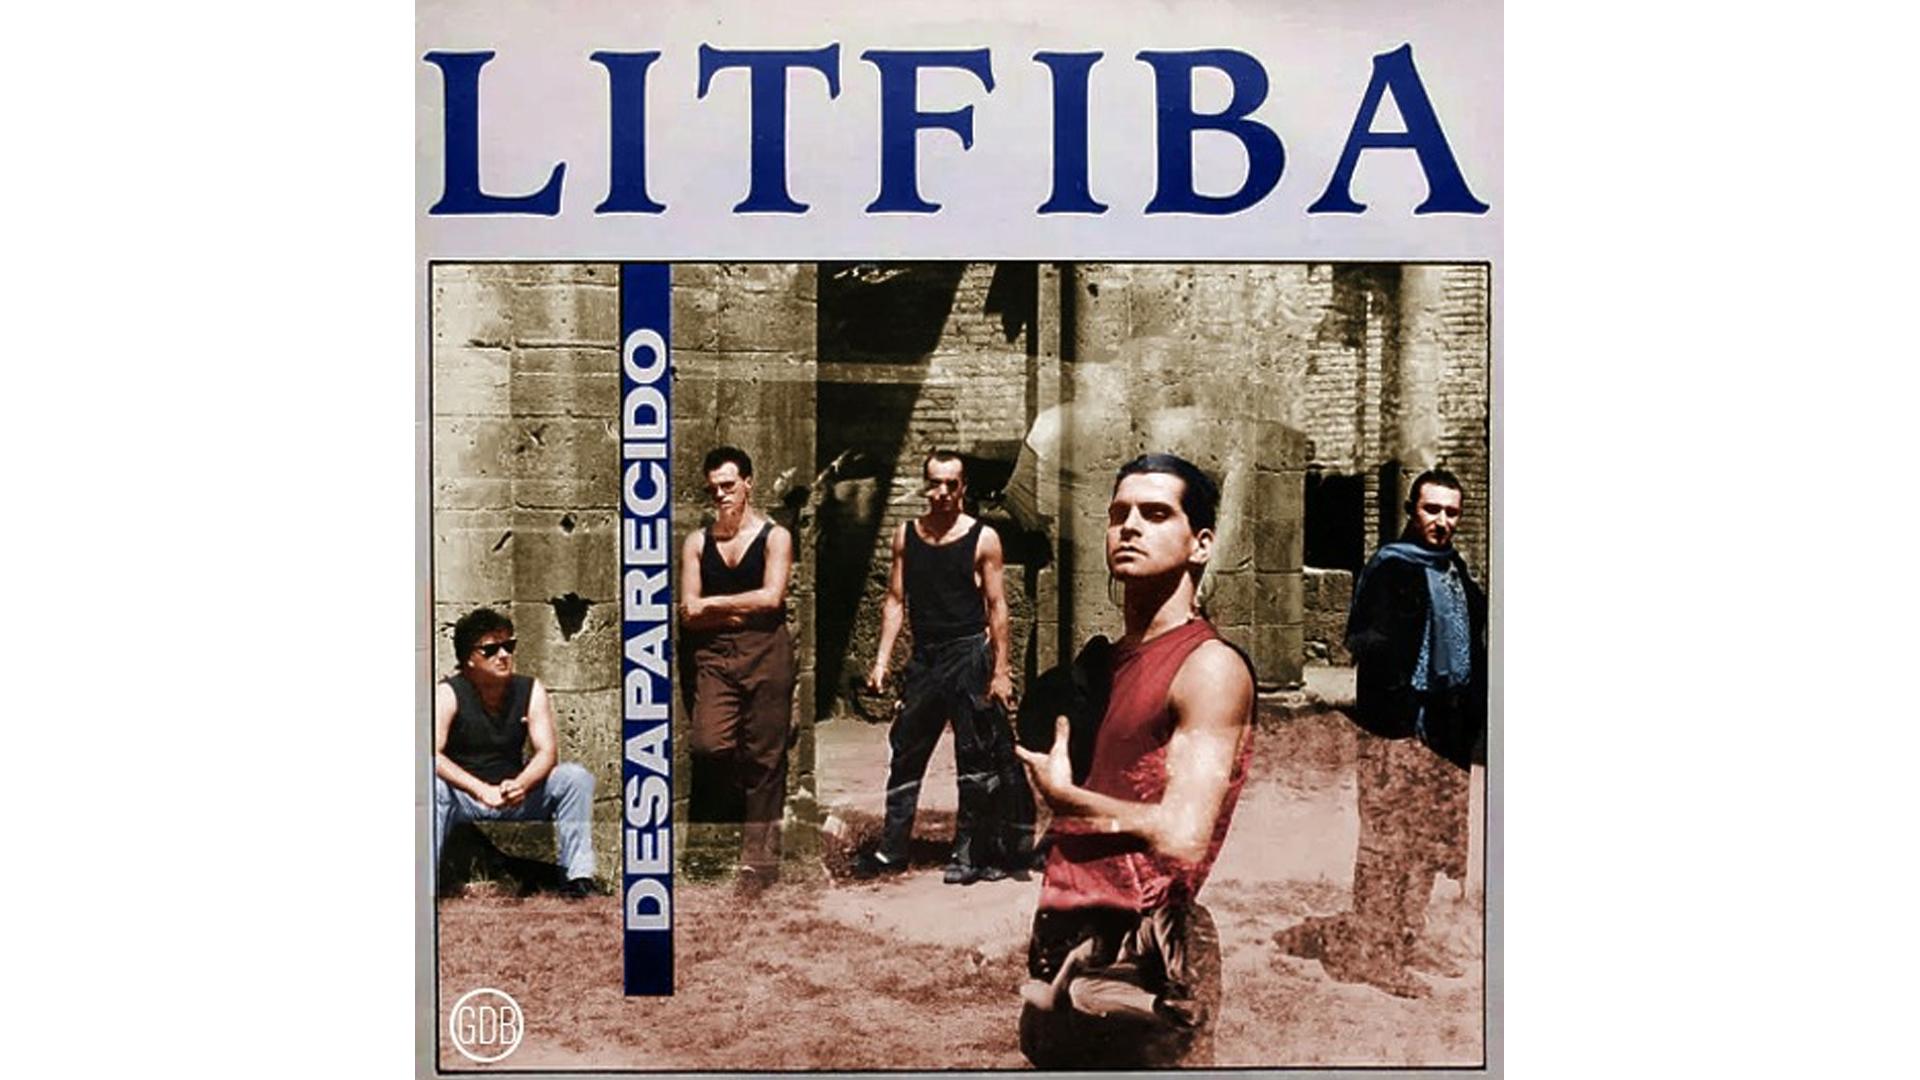 Litfiba - Desaparecido - Gianluca De Bianchi - Jeanzilla